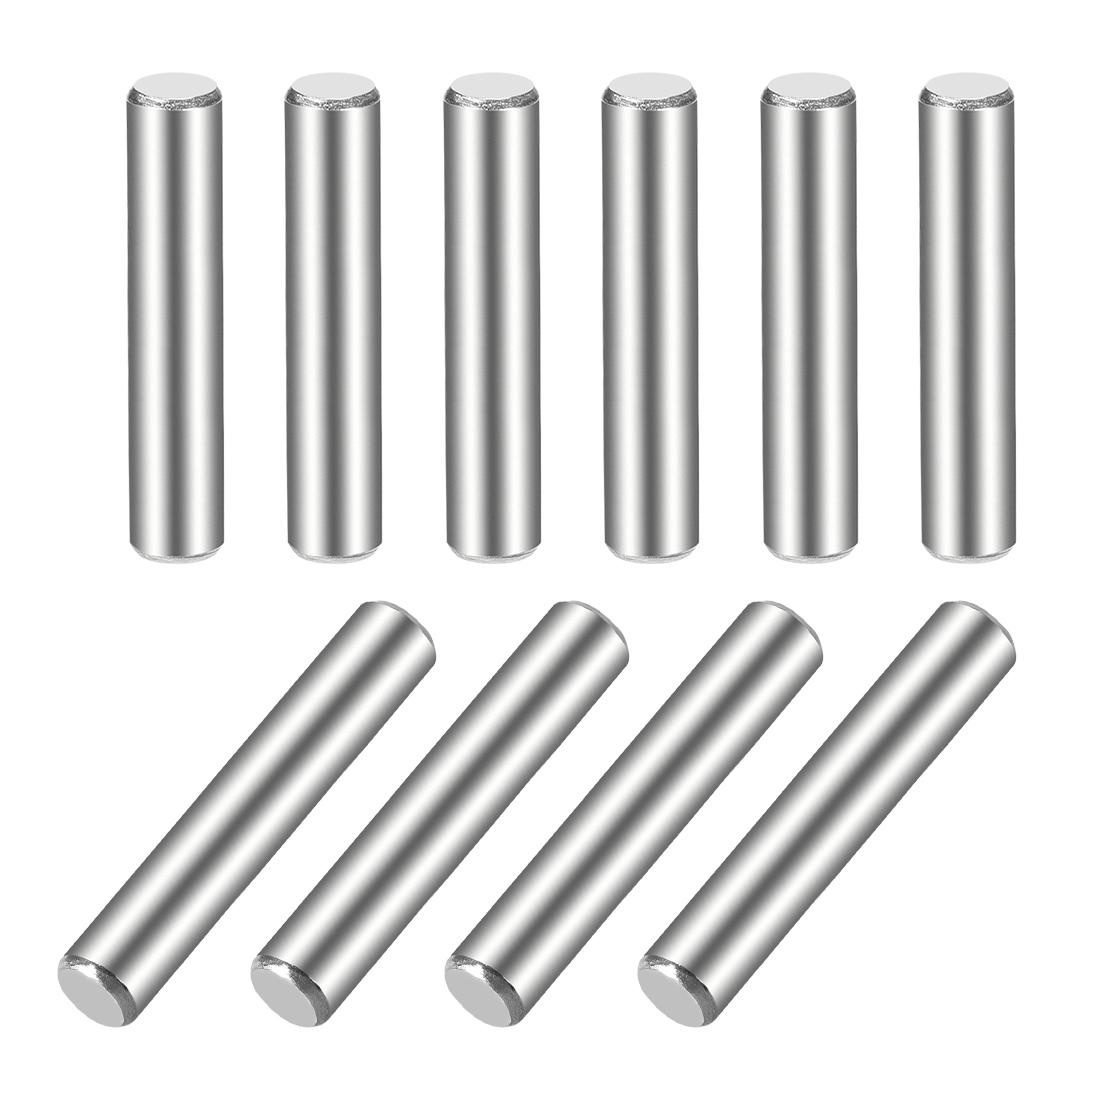 10Pcs 5mm x 35mm Dowel Pin 304 Stainless Steel Shelf Support Pin Fasten